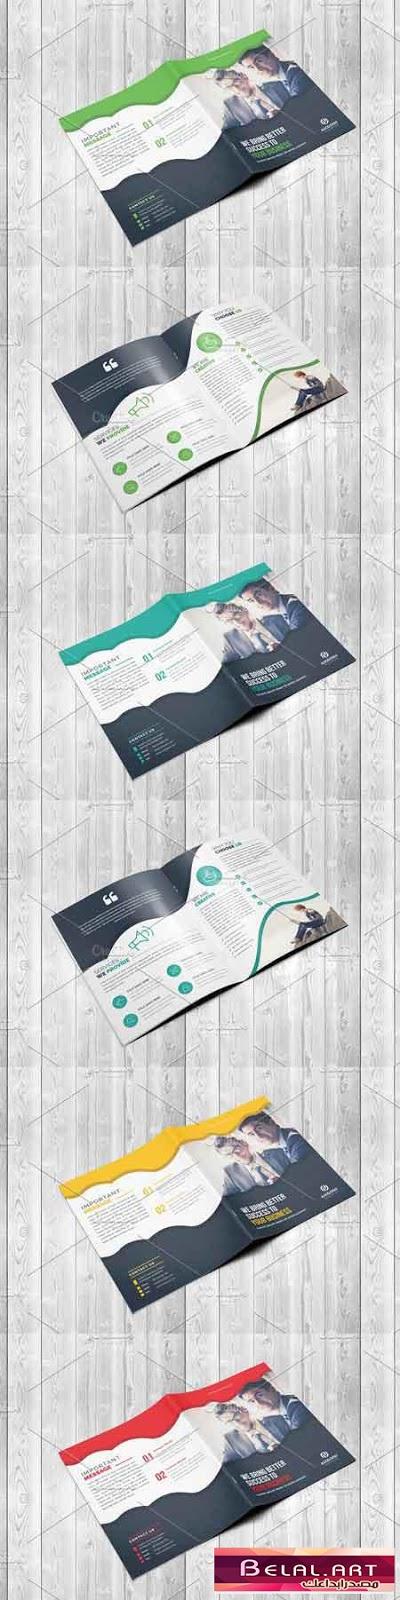 Corporate Bi-Fold Brochure Template 2635548-belal.art